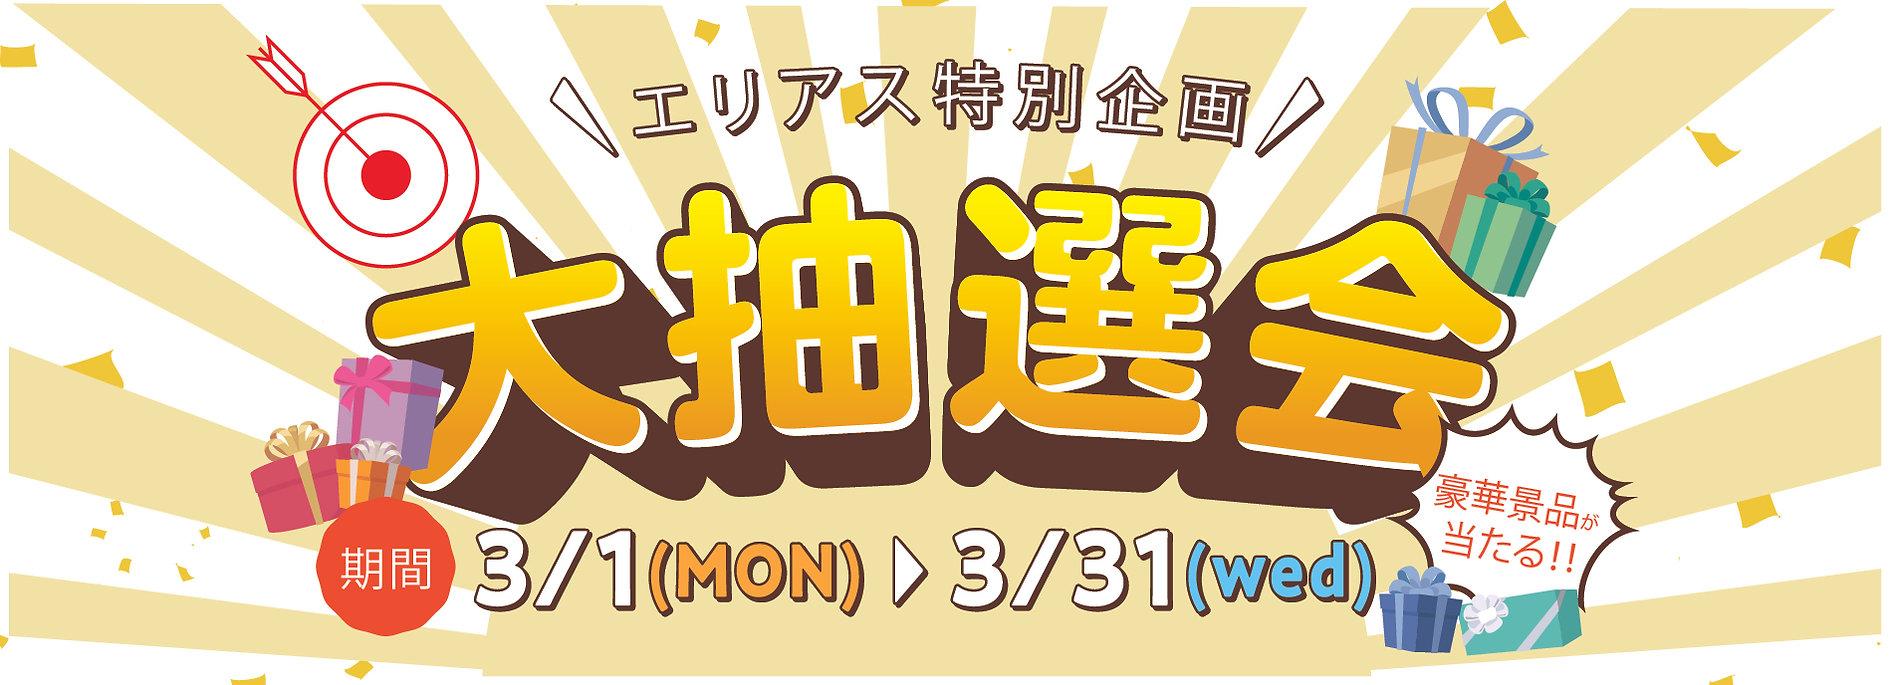 210222_抽選会特設ページ TOP-02.jpg